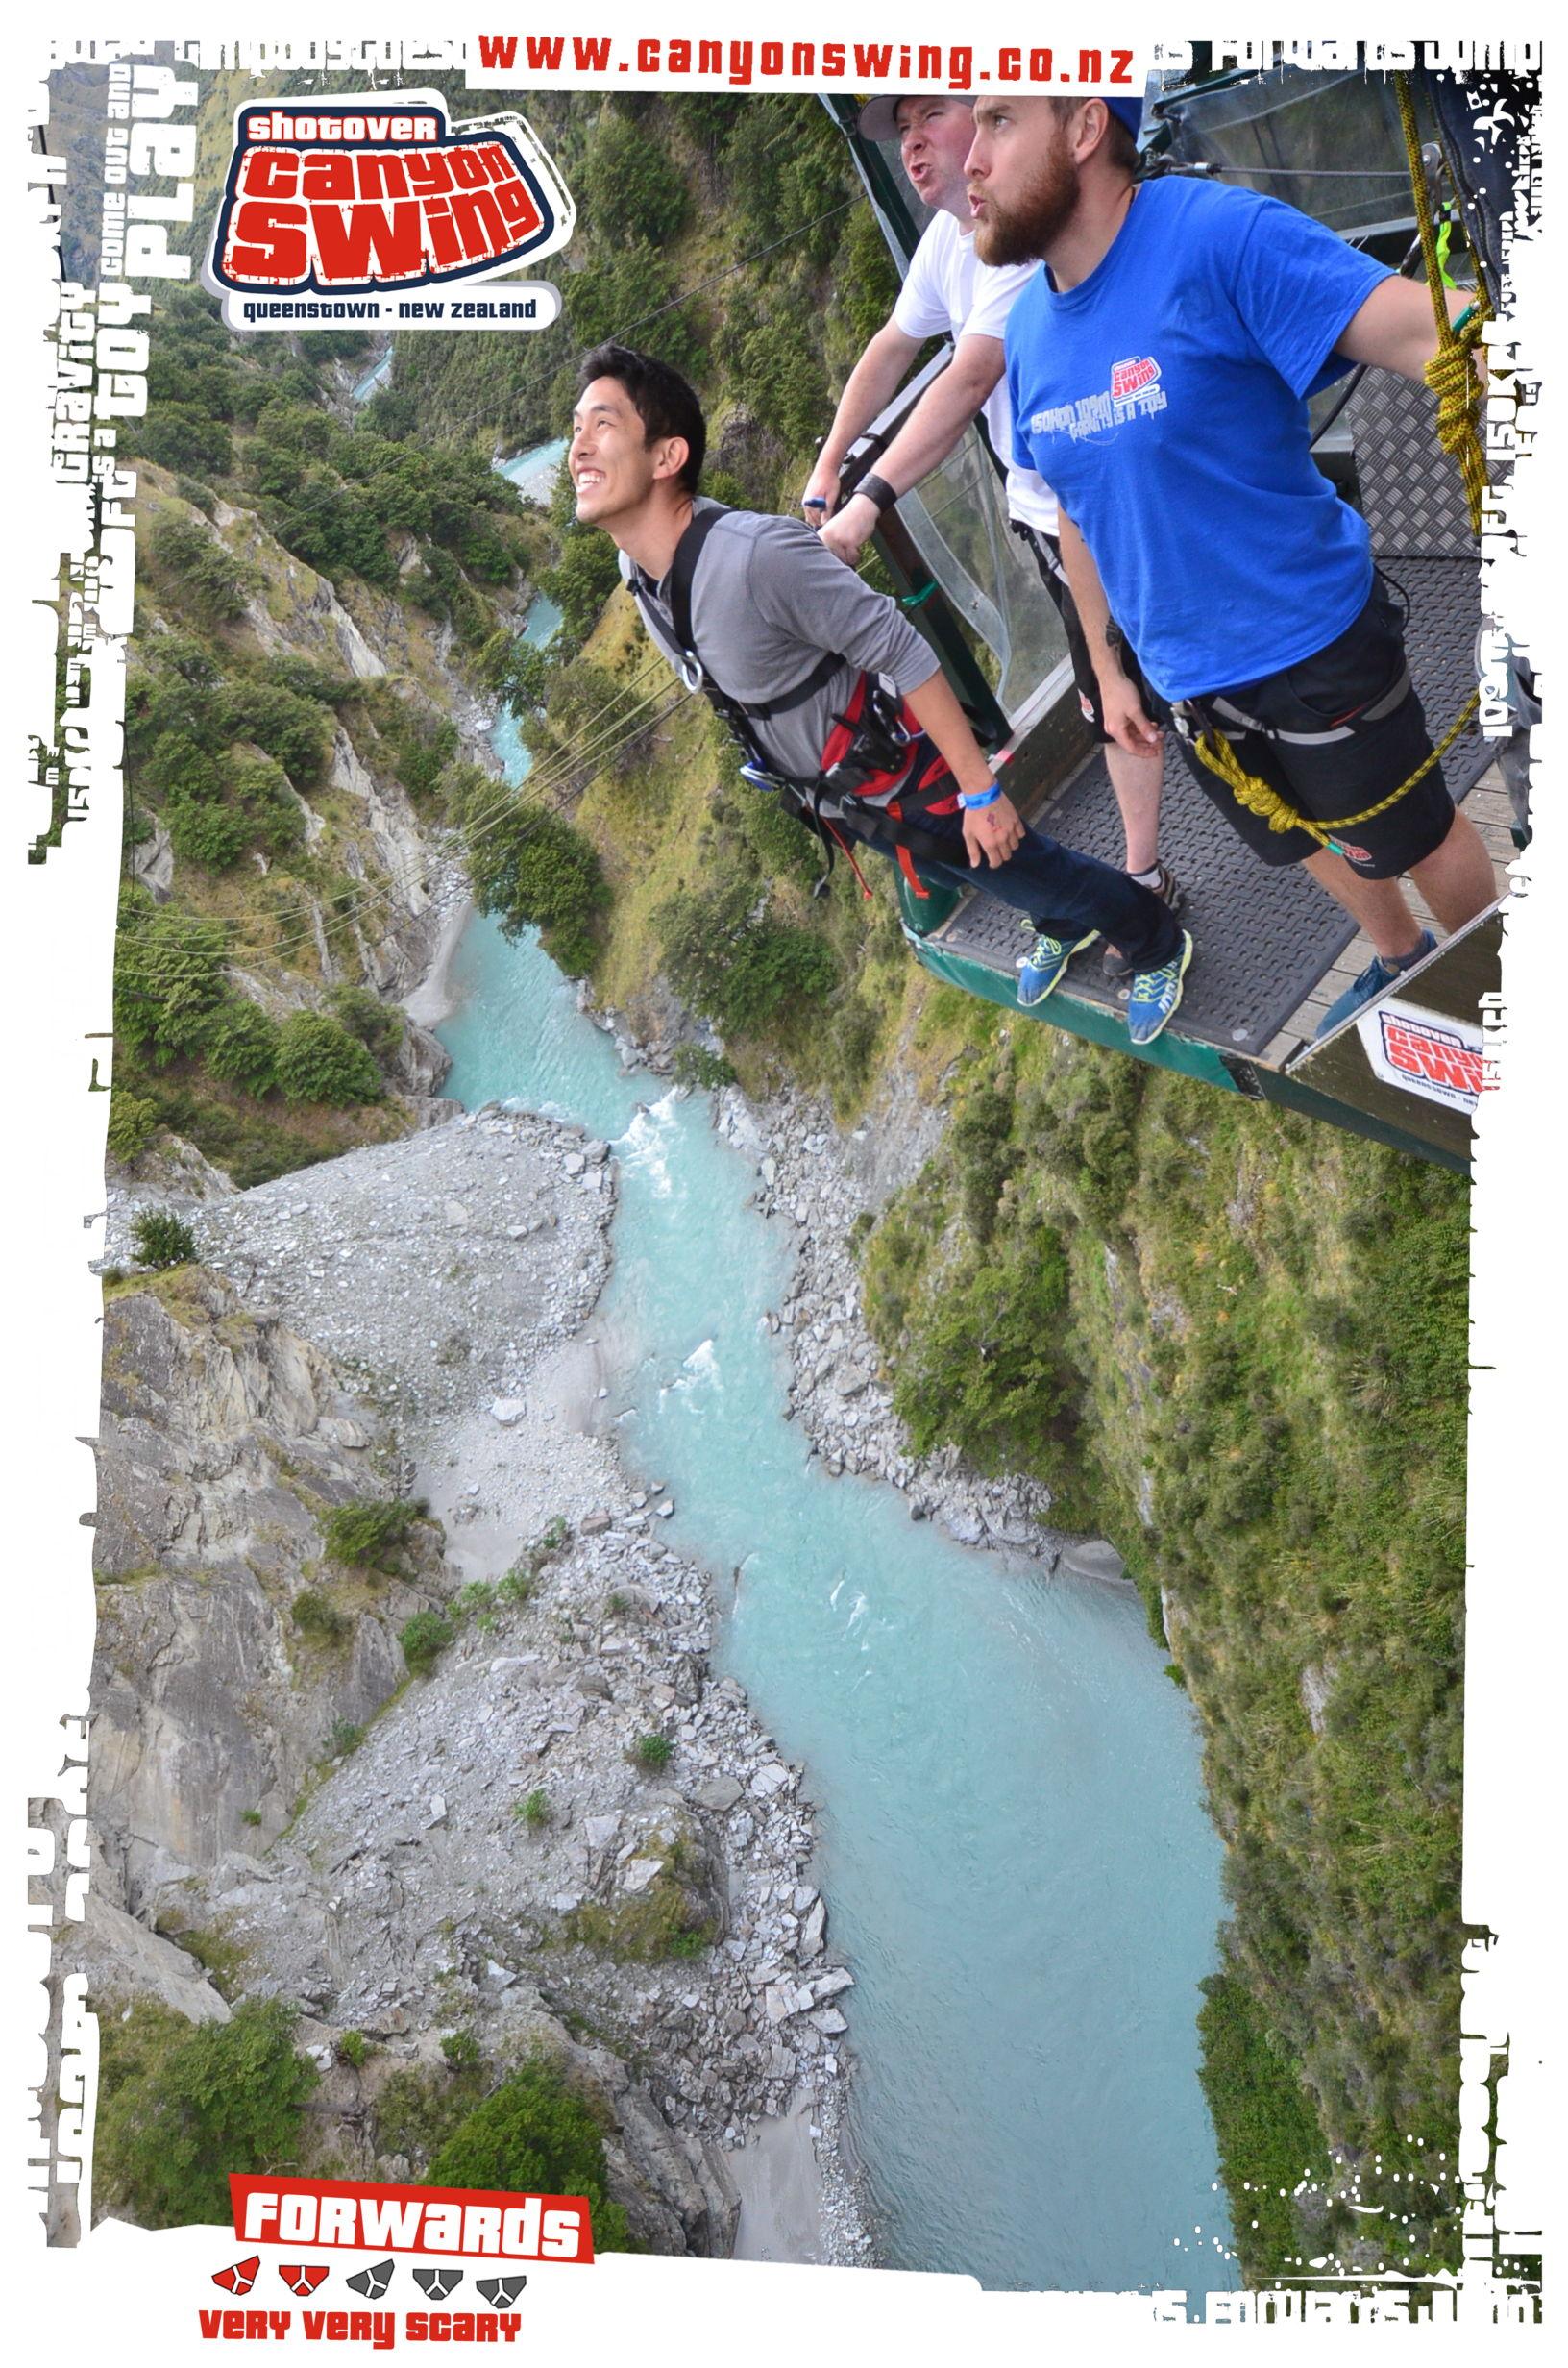 Swing 05 - Photo 01.jpg